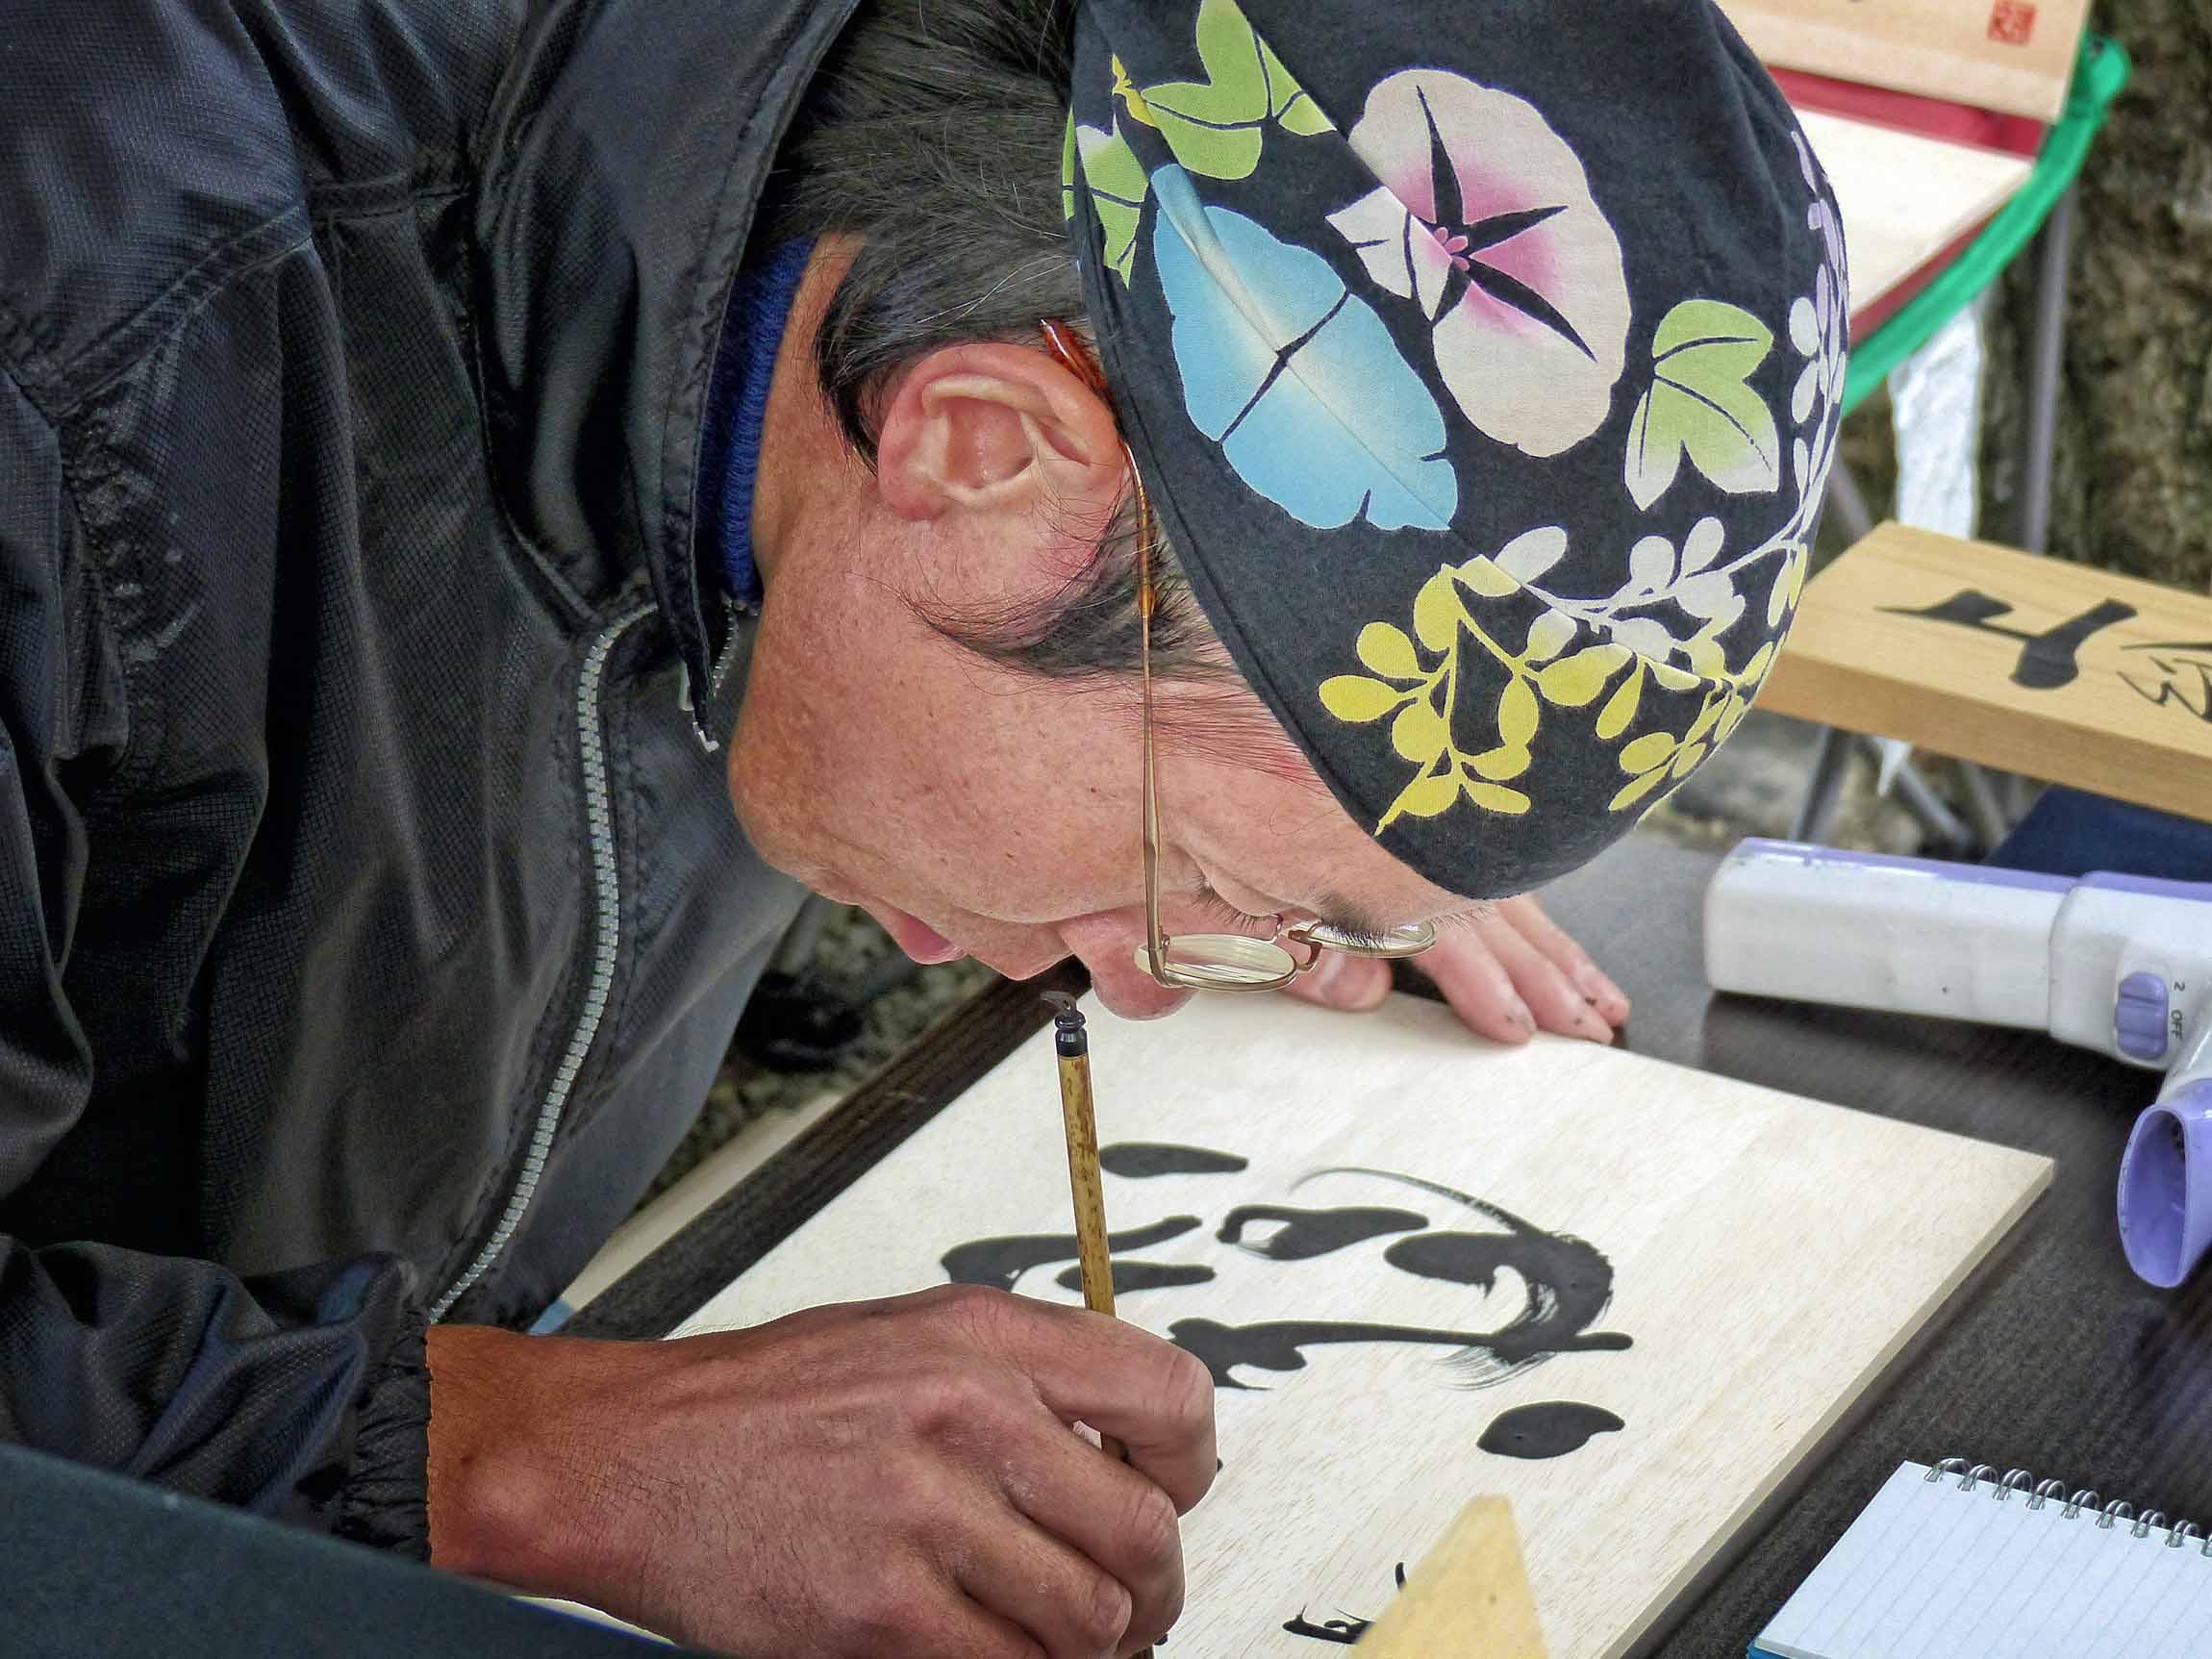 Man doing calligraphy